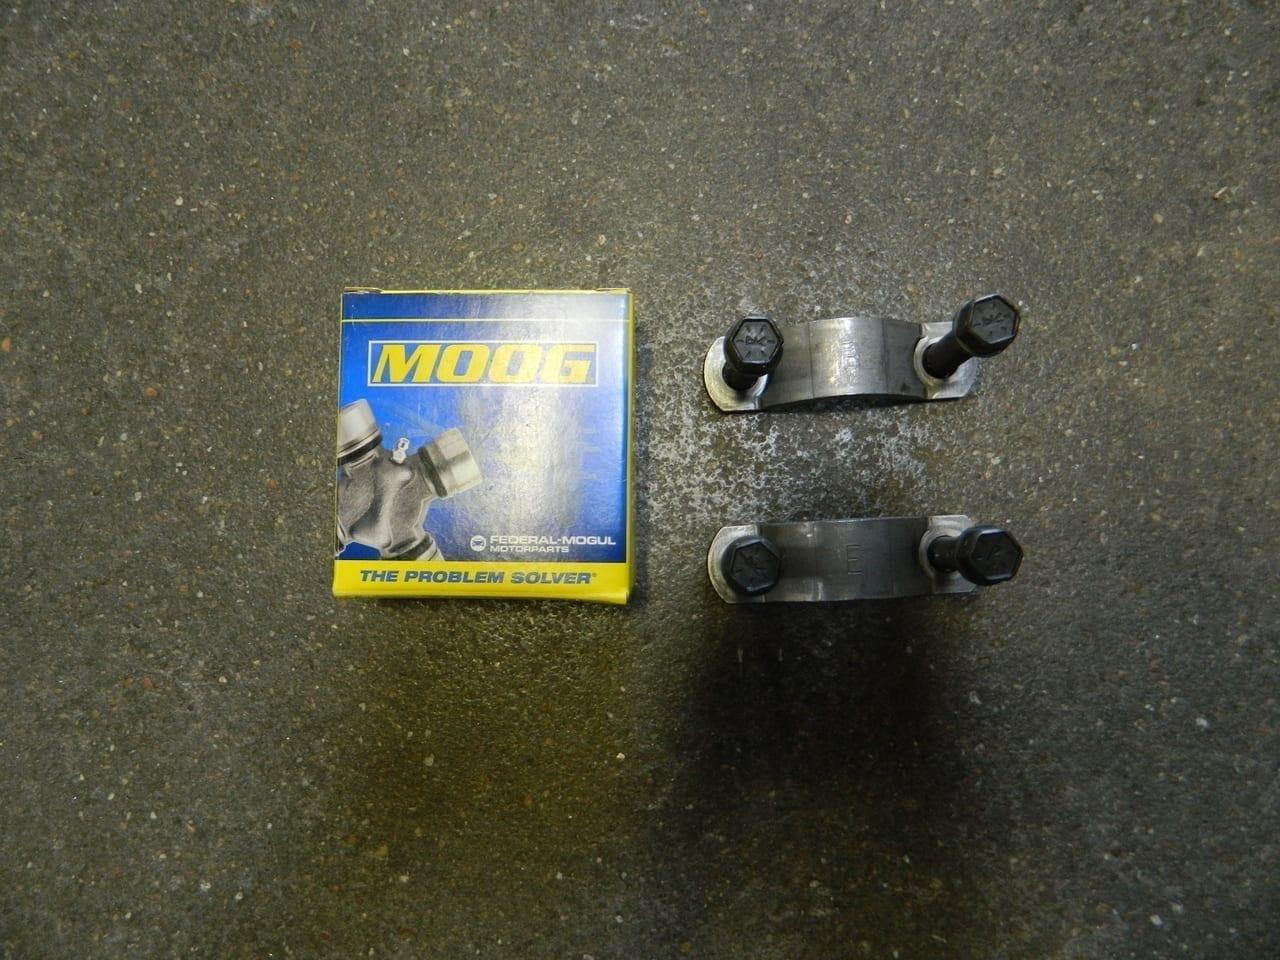 Chevy GM 1480 1485 Pinion Yoke Bolt & Strap Kit 10.5 11.5 14 Bolt Rear Axle Universal Joint